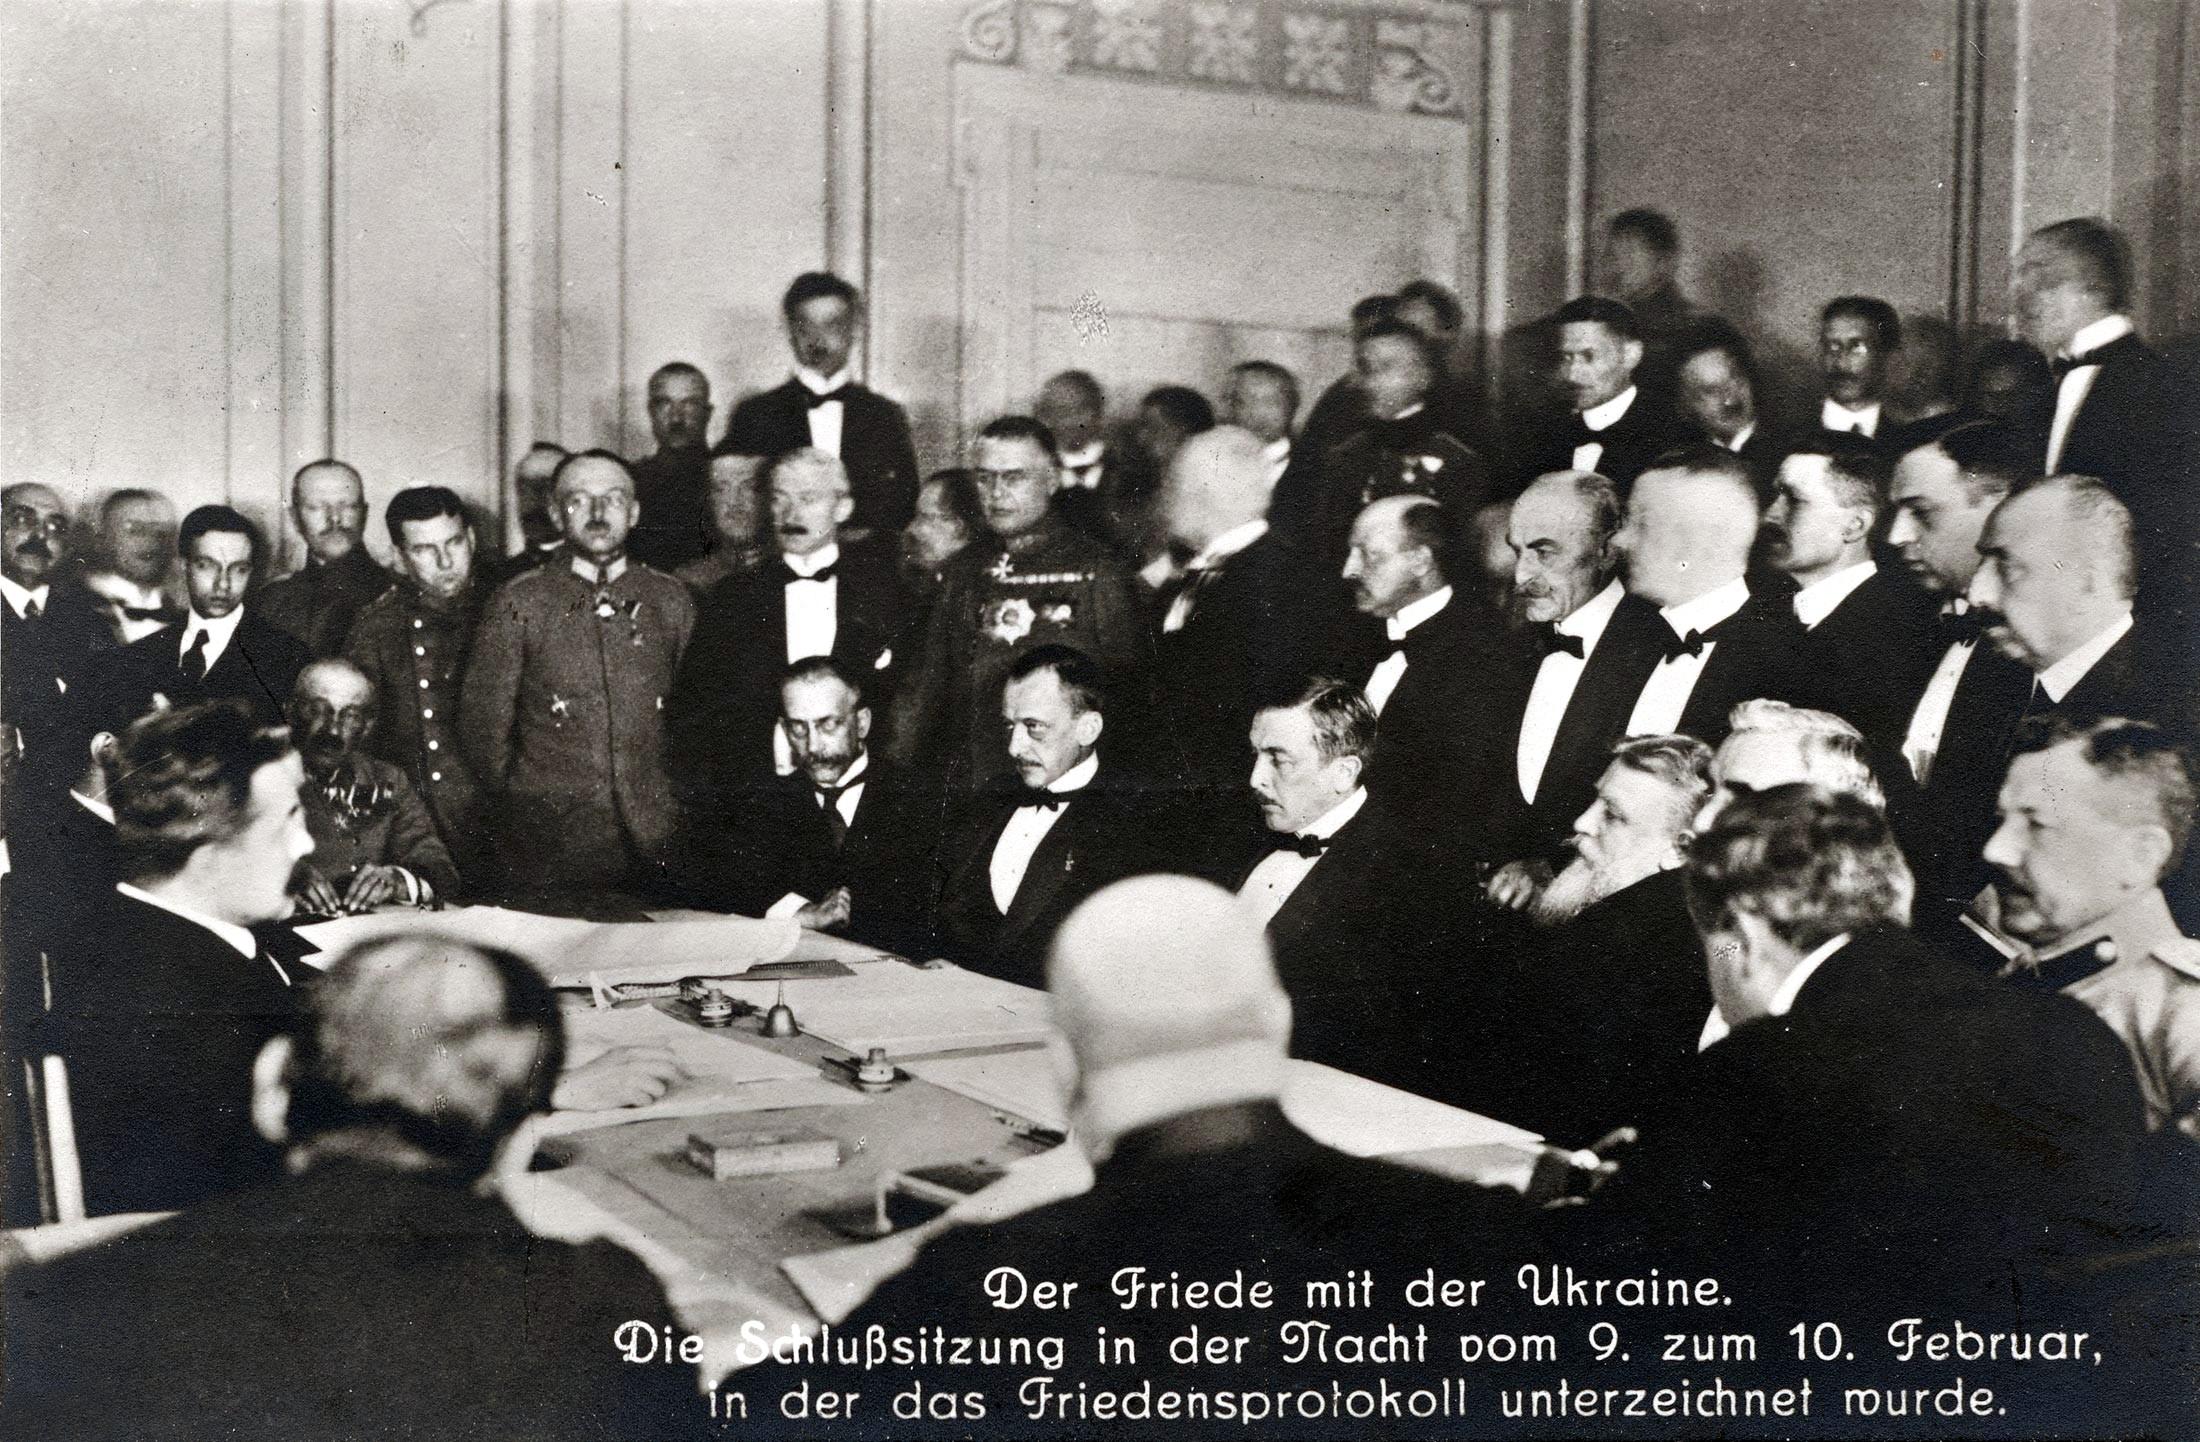 http://upload.wikimedia.org/wikipedia/commons/4/4f/Brest-litovsk-feb-9-1918a.jpg